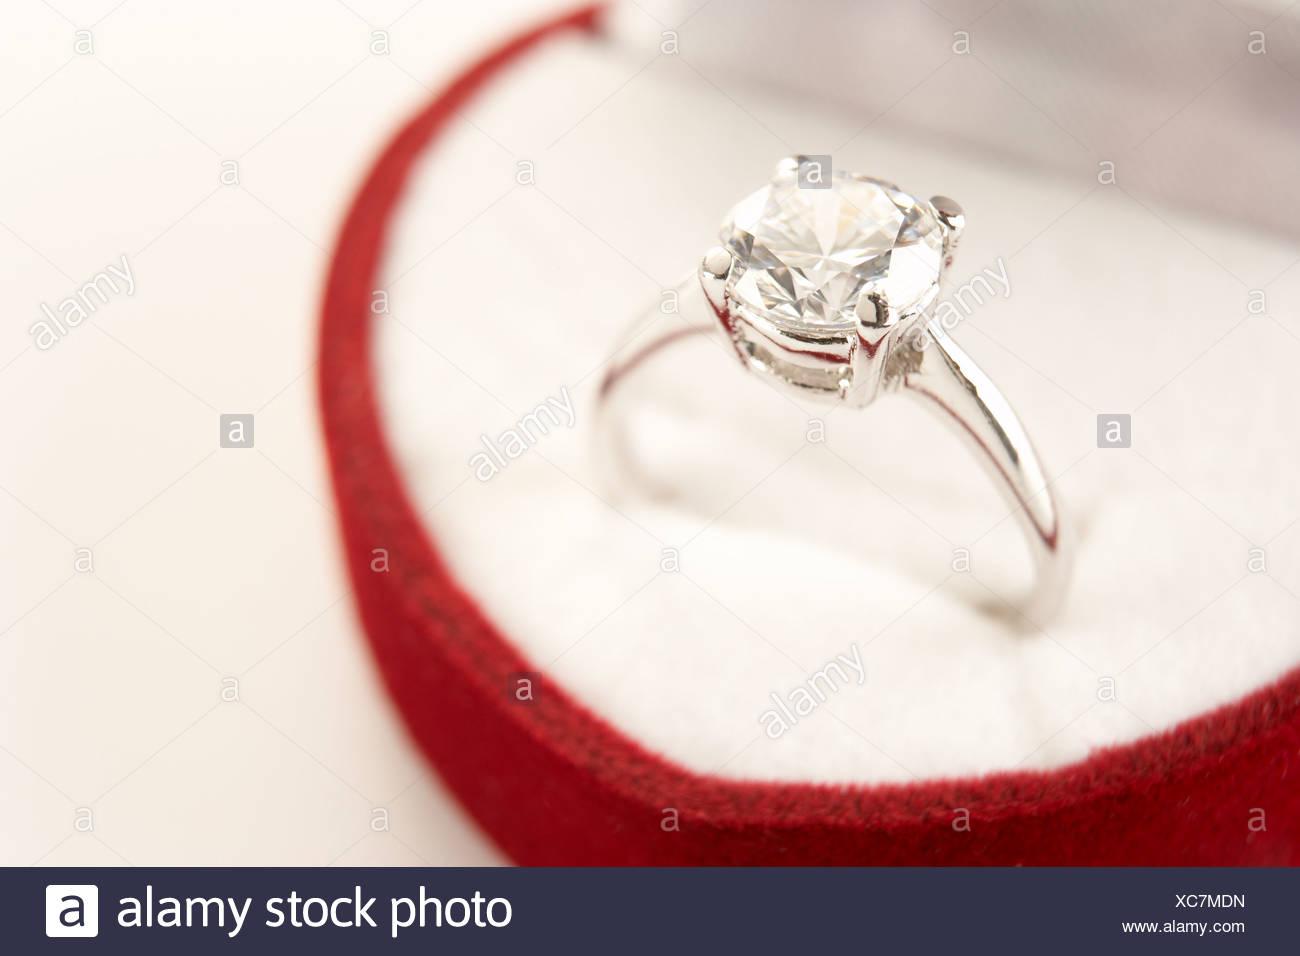 Wedding Ring Rings Box Stock Photos & Wedding Ring Rings Box Stock ...